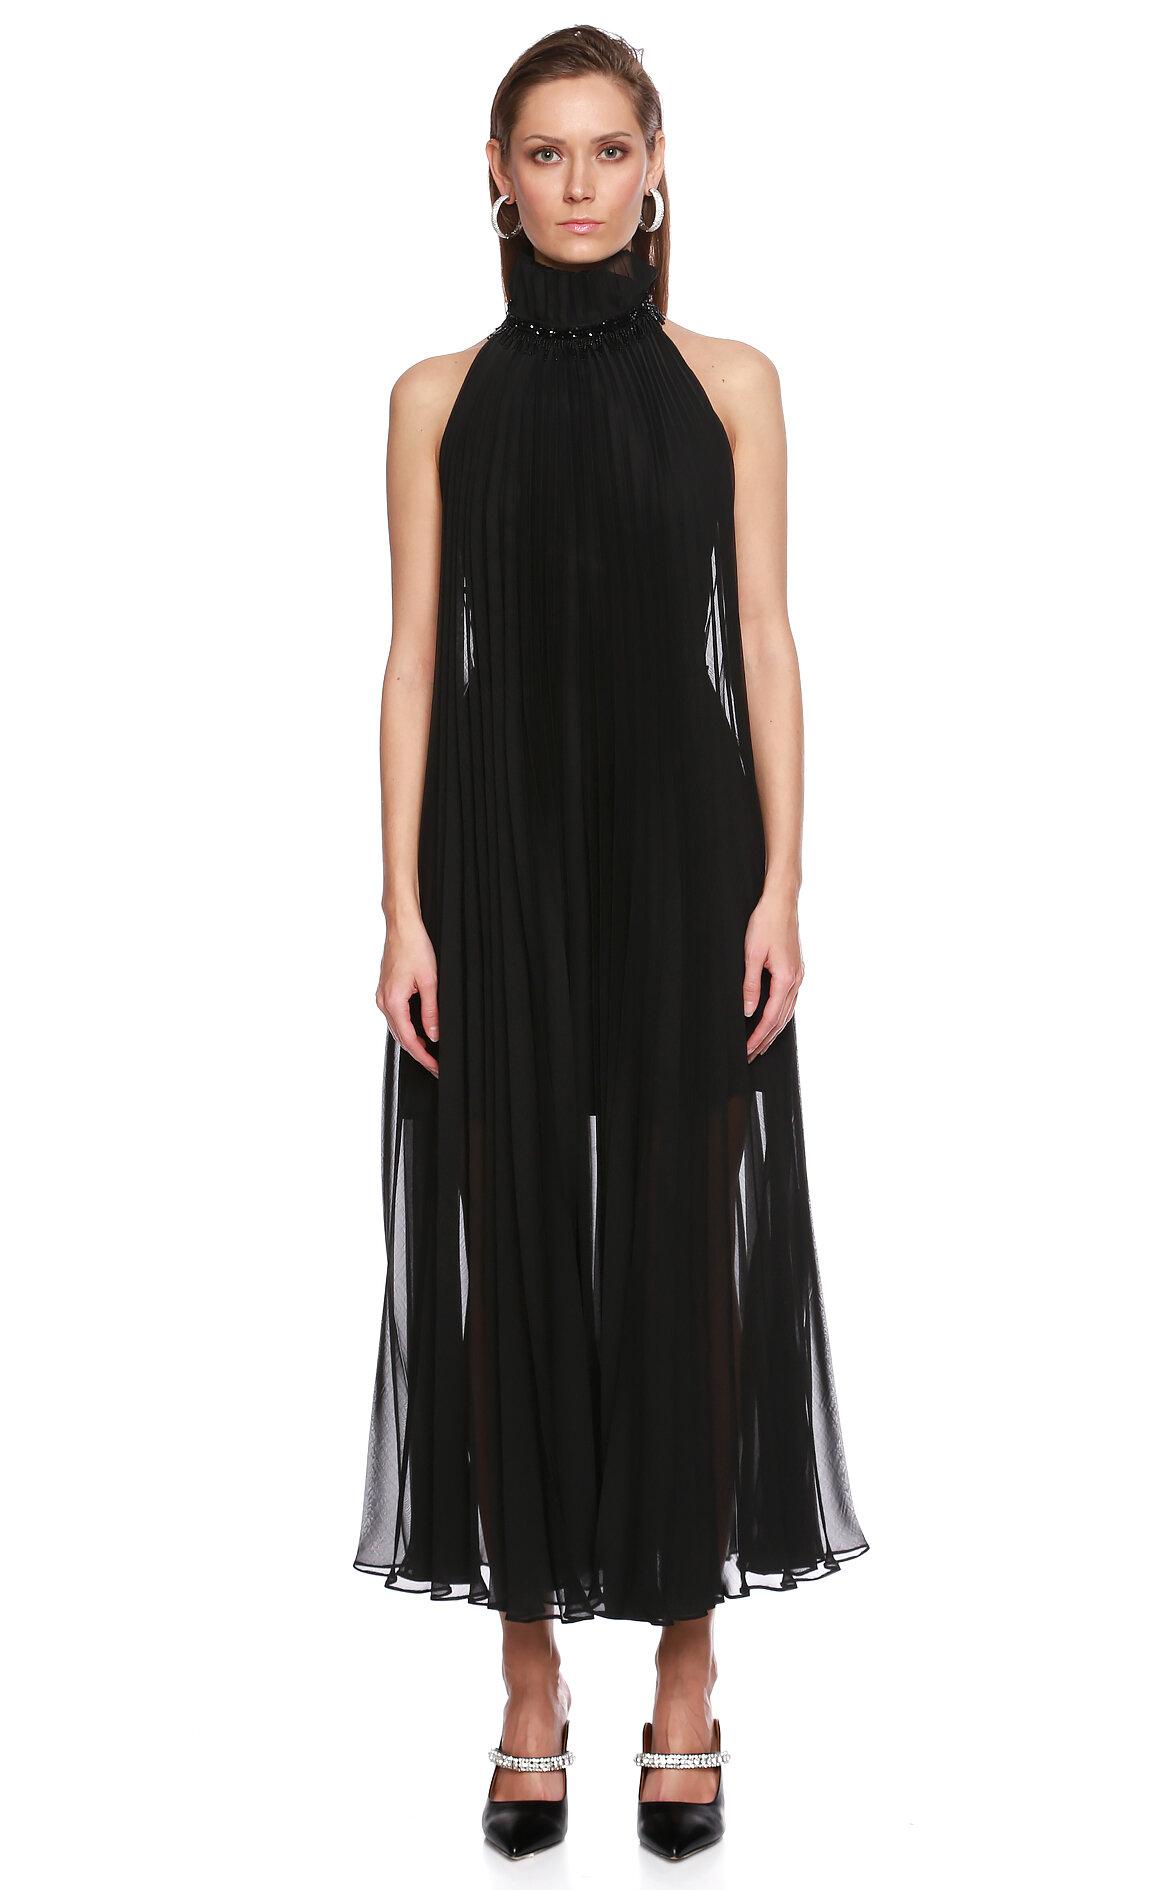 Meltem Ozbek-Meltem Ozbek Boğazlı Midi Siyah Elbise